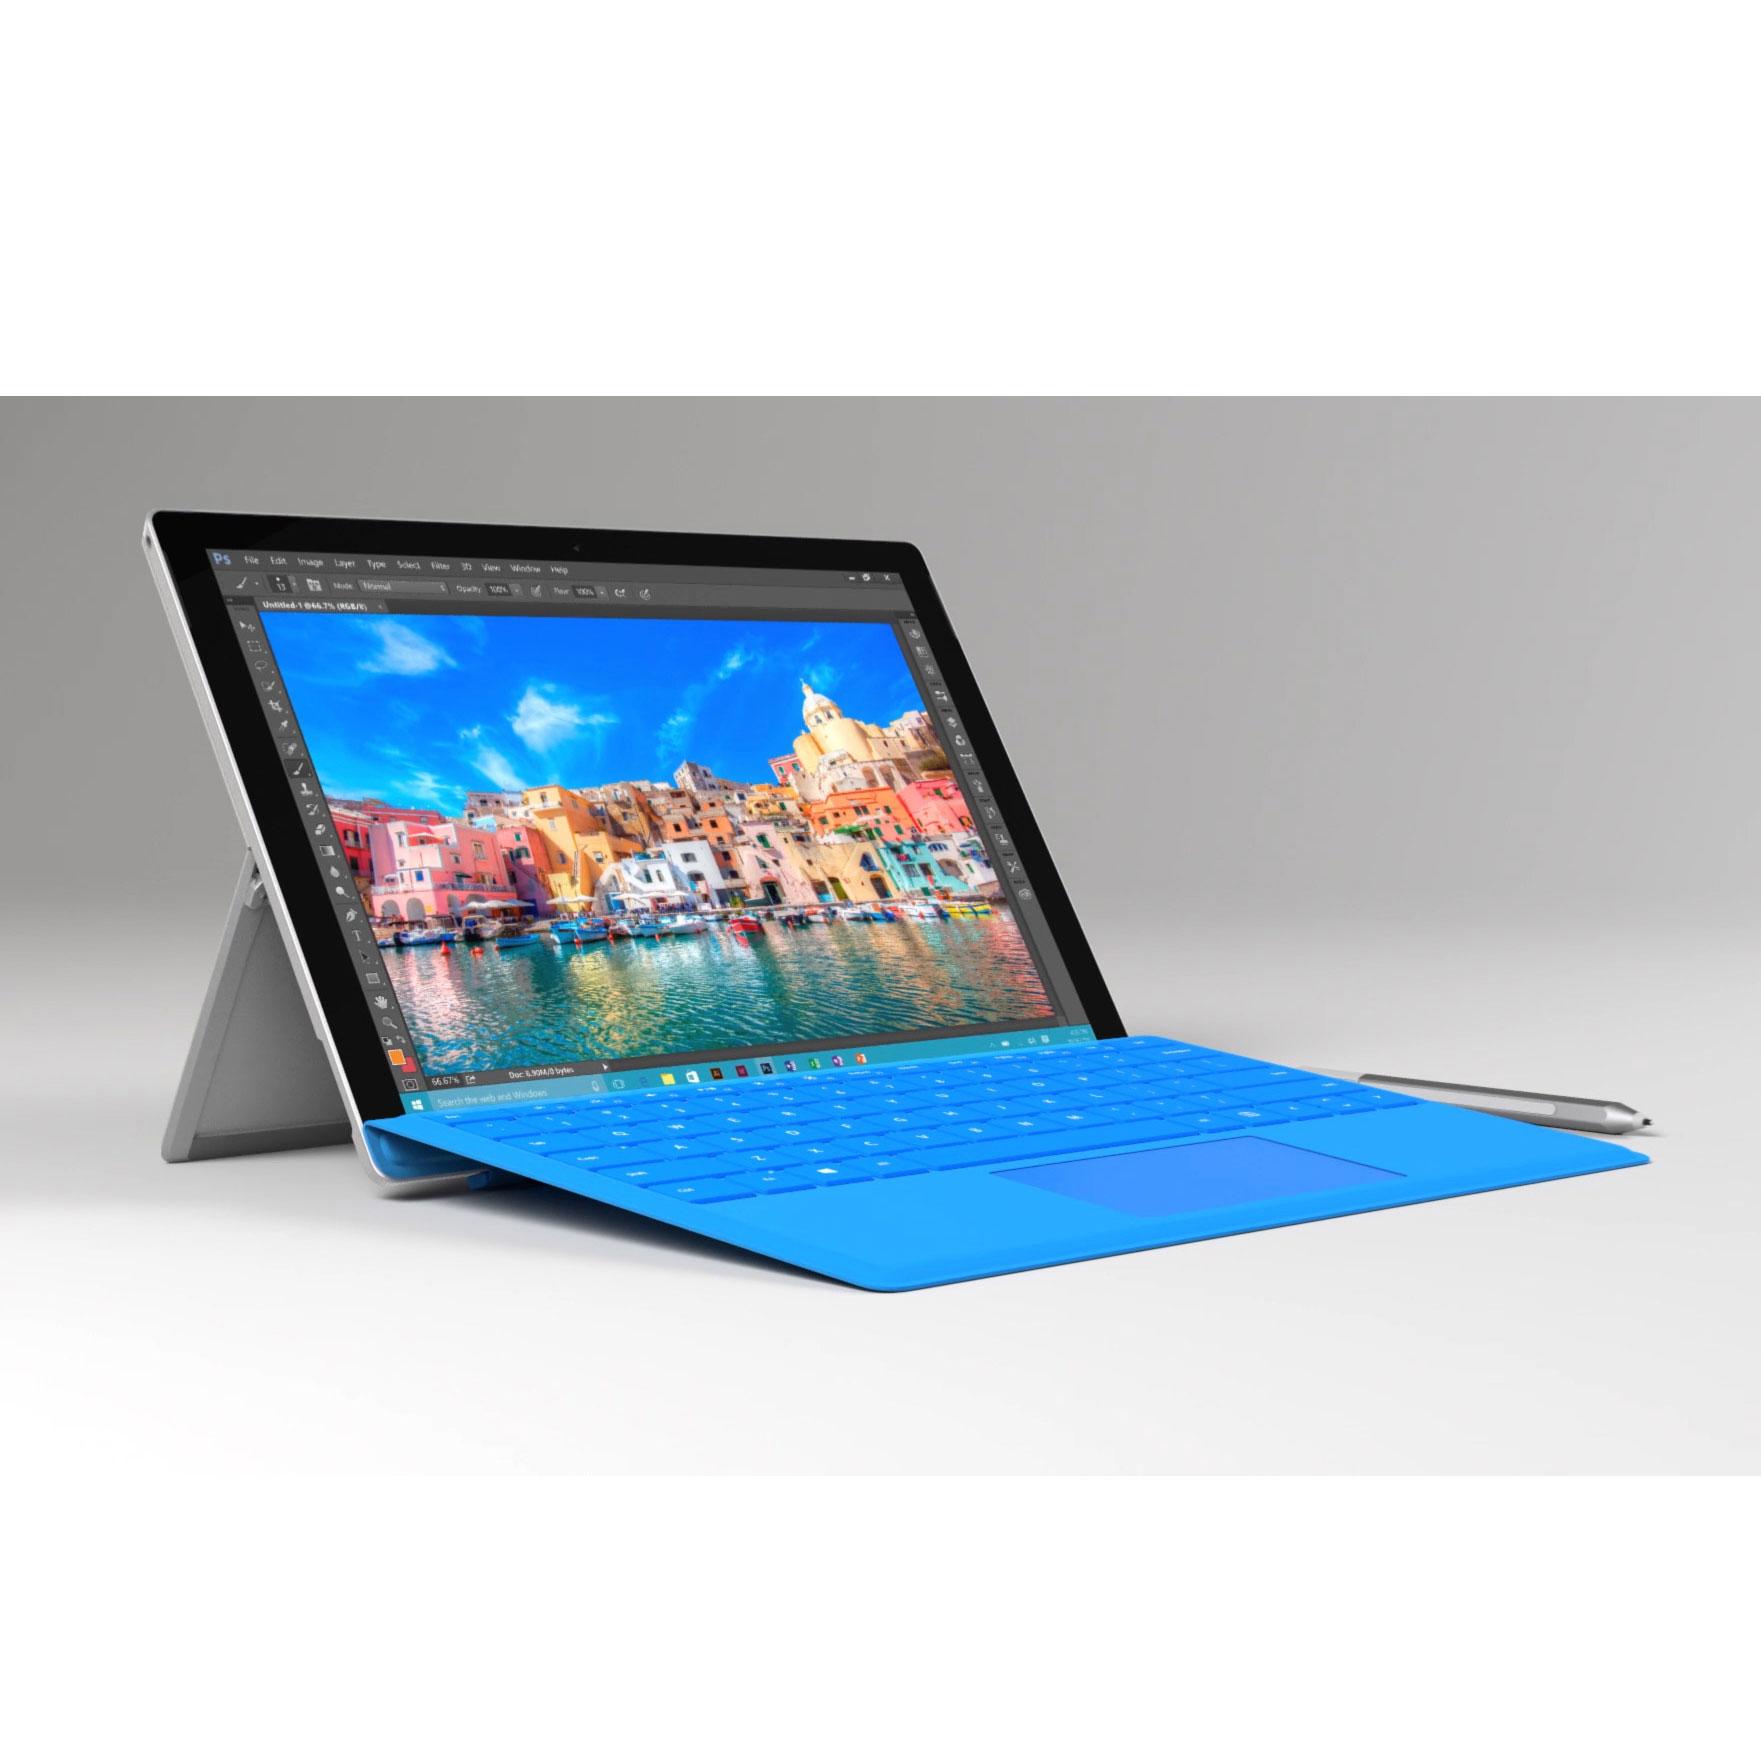 Tablet/Laptop